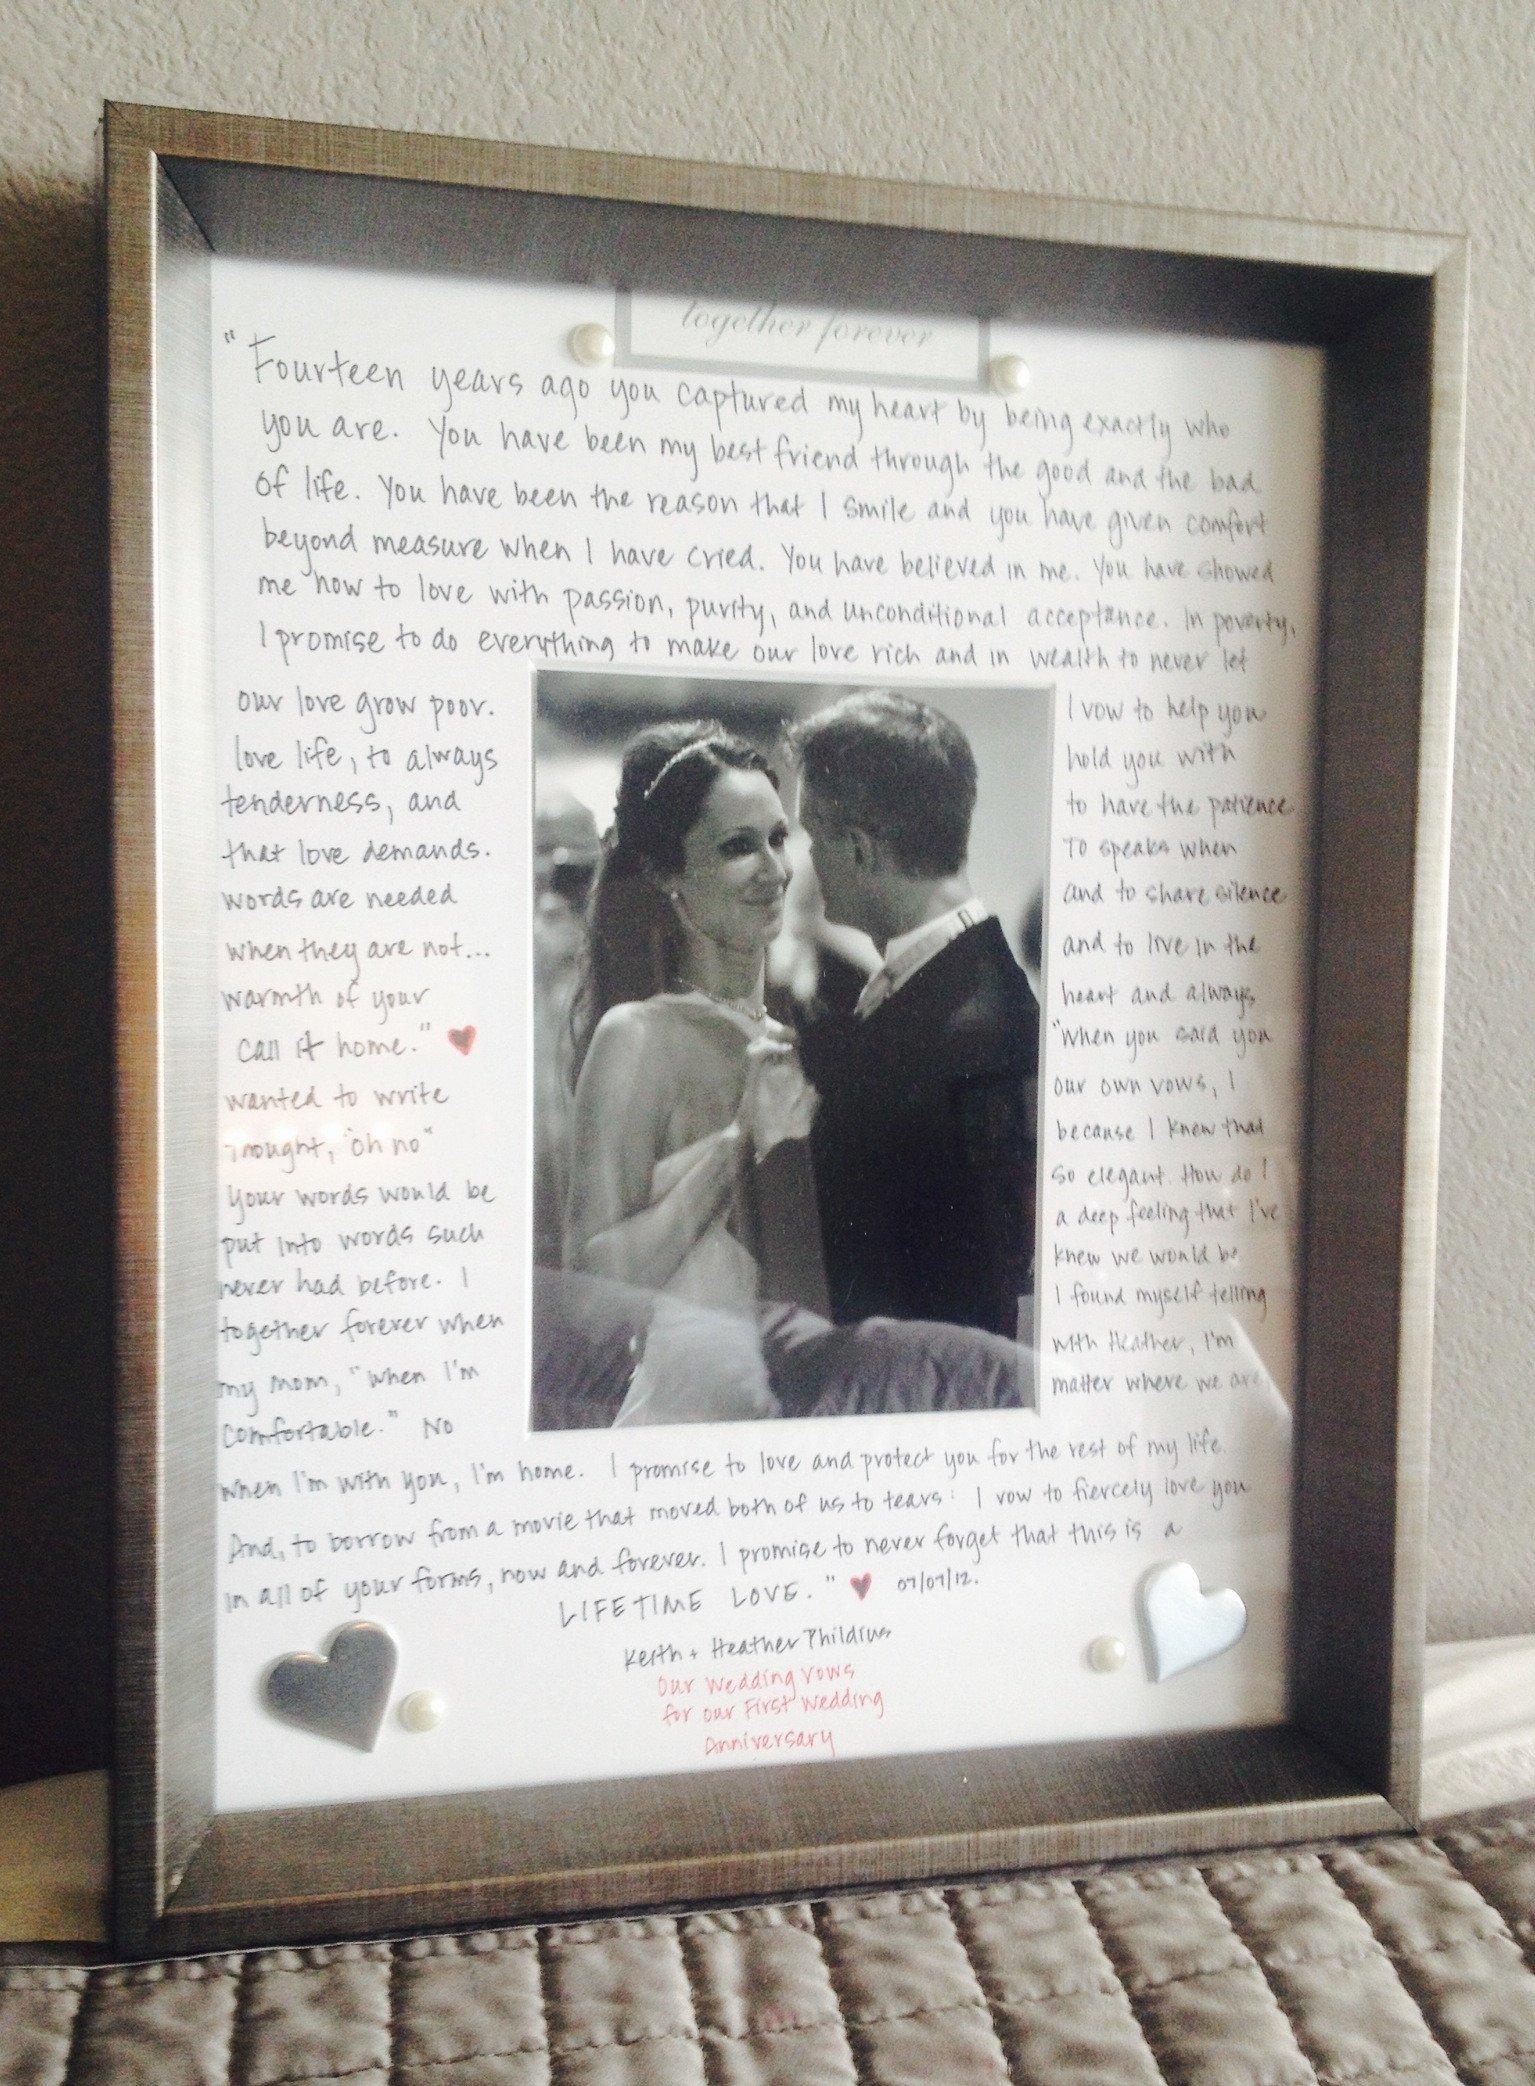 10 Fantastic Gift Ideas For Wedding Anniversary ideas fearsome year wedding anniversary gift for husband beautiful 1 2020